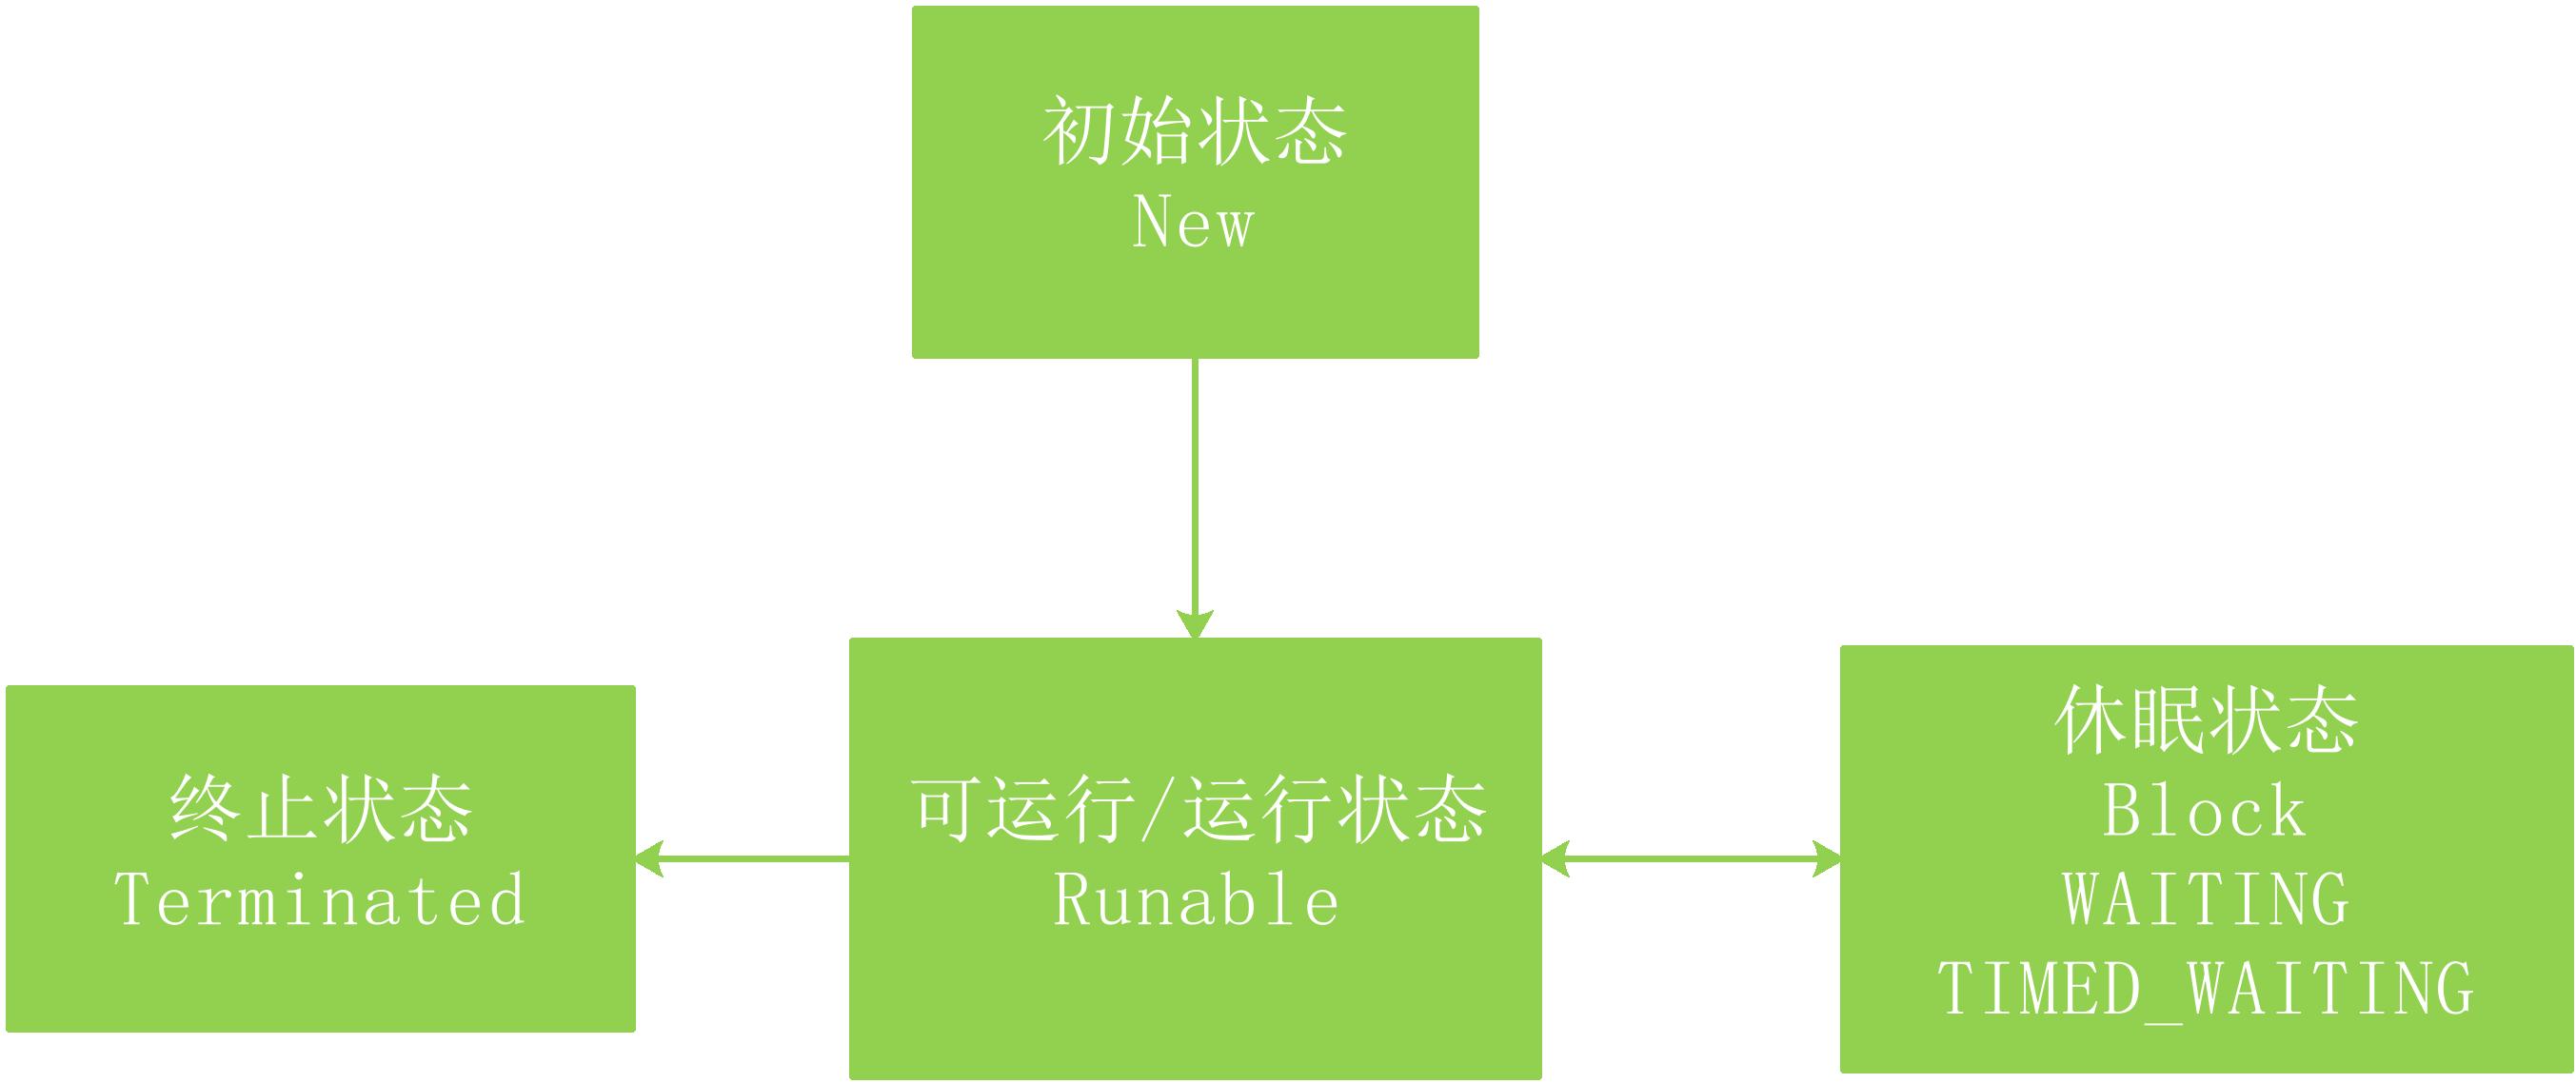 Java中的线程状态转换图